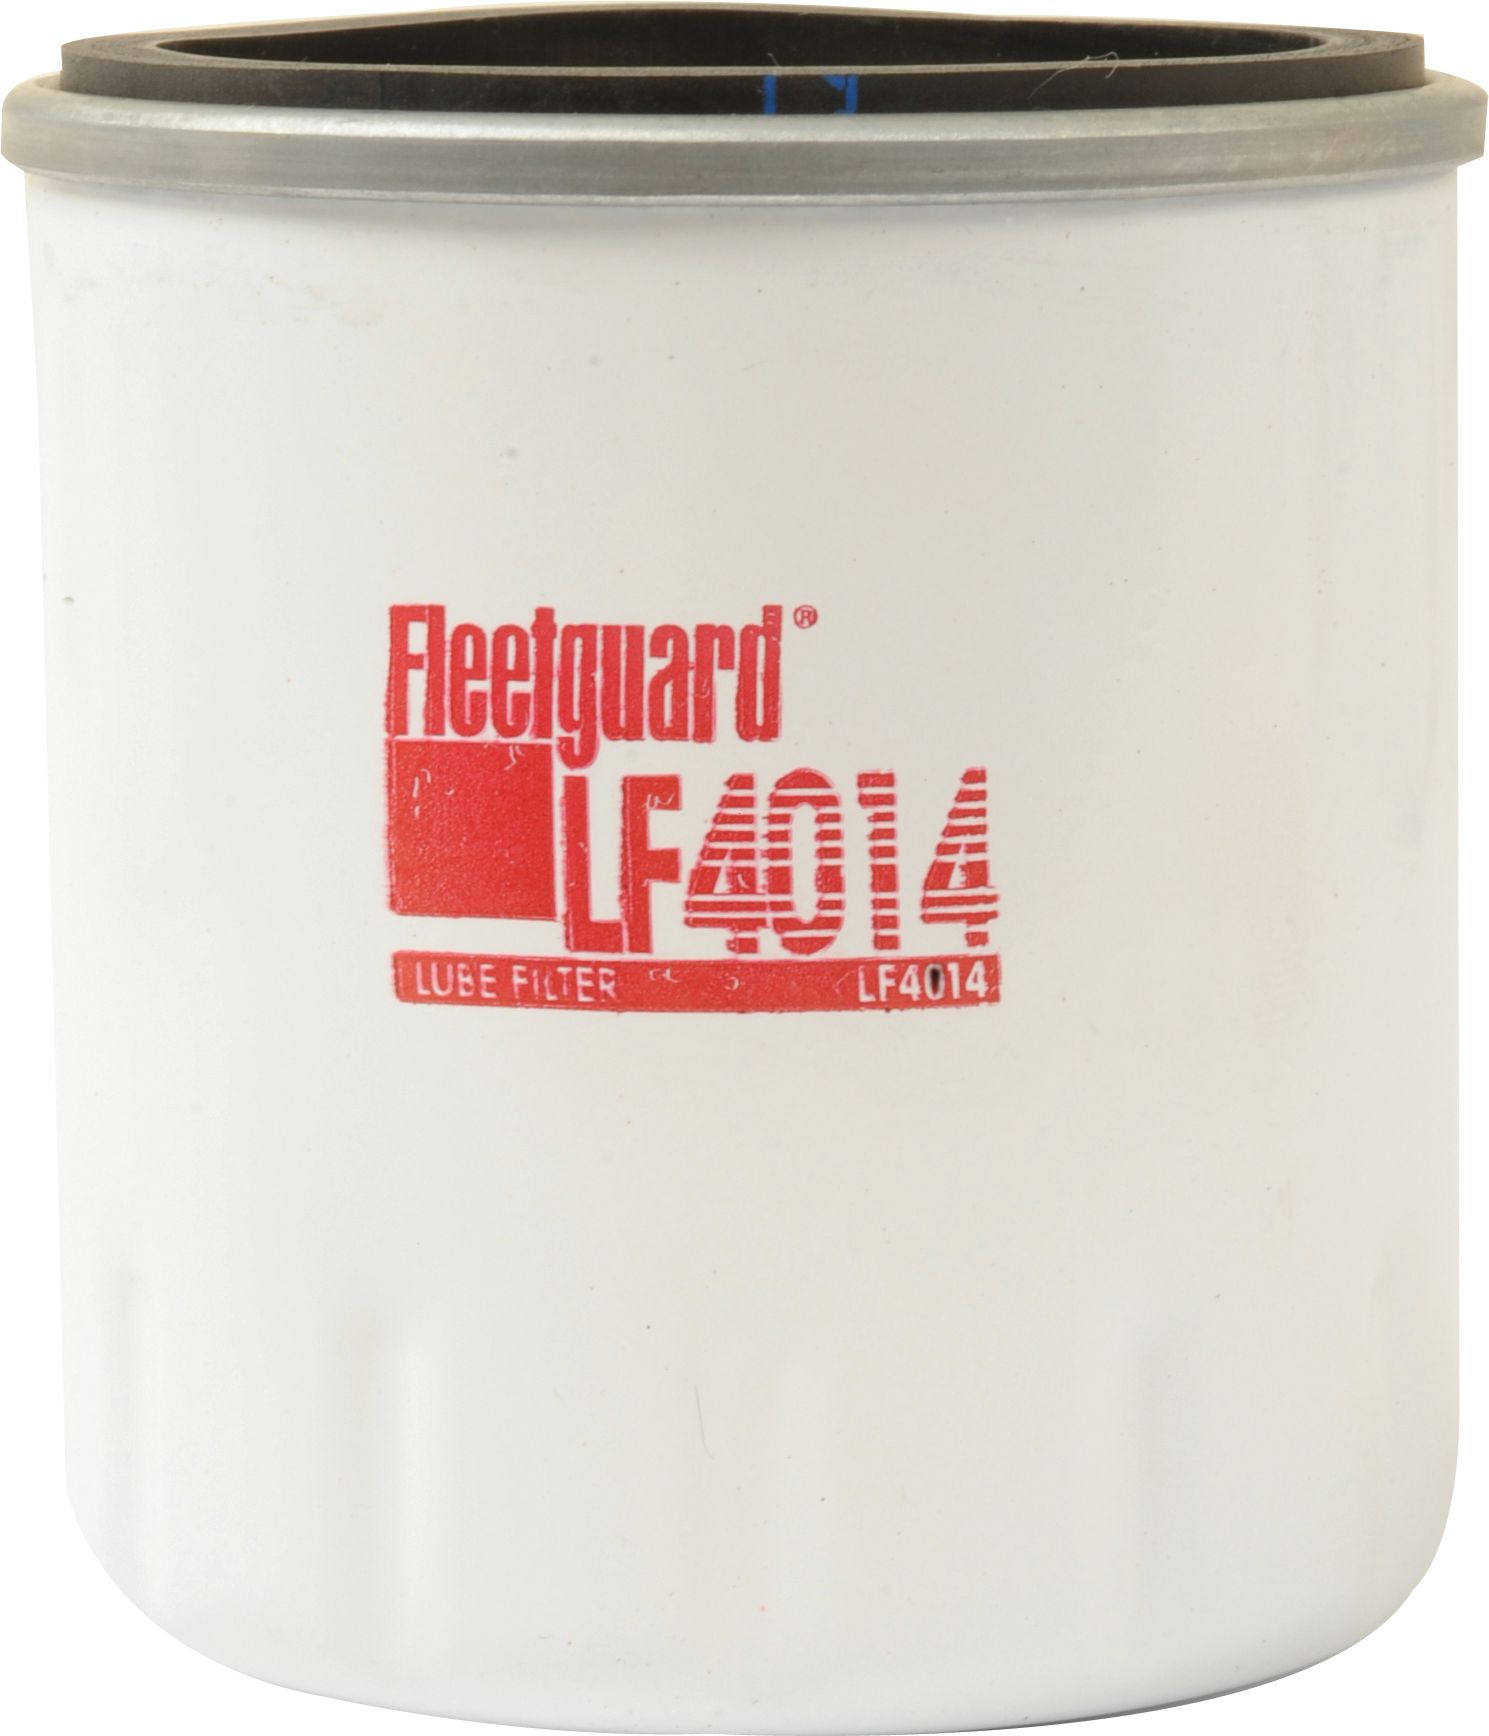 CLAAS OIL FILTER LF4014 109457